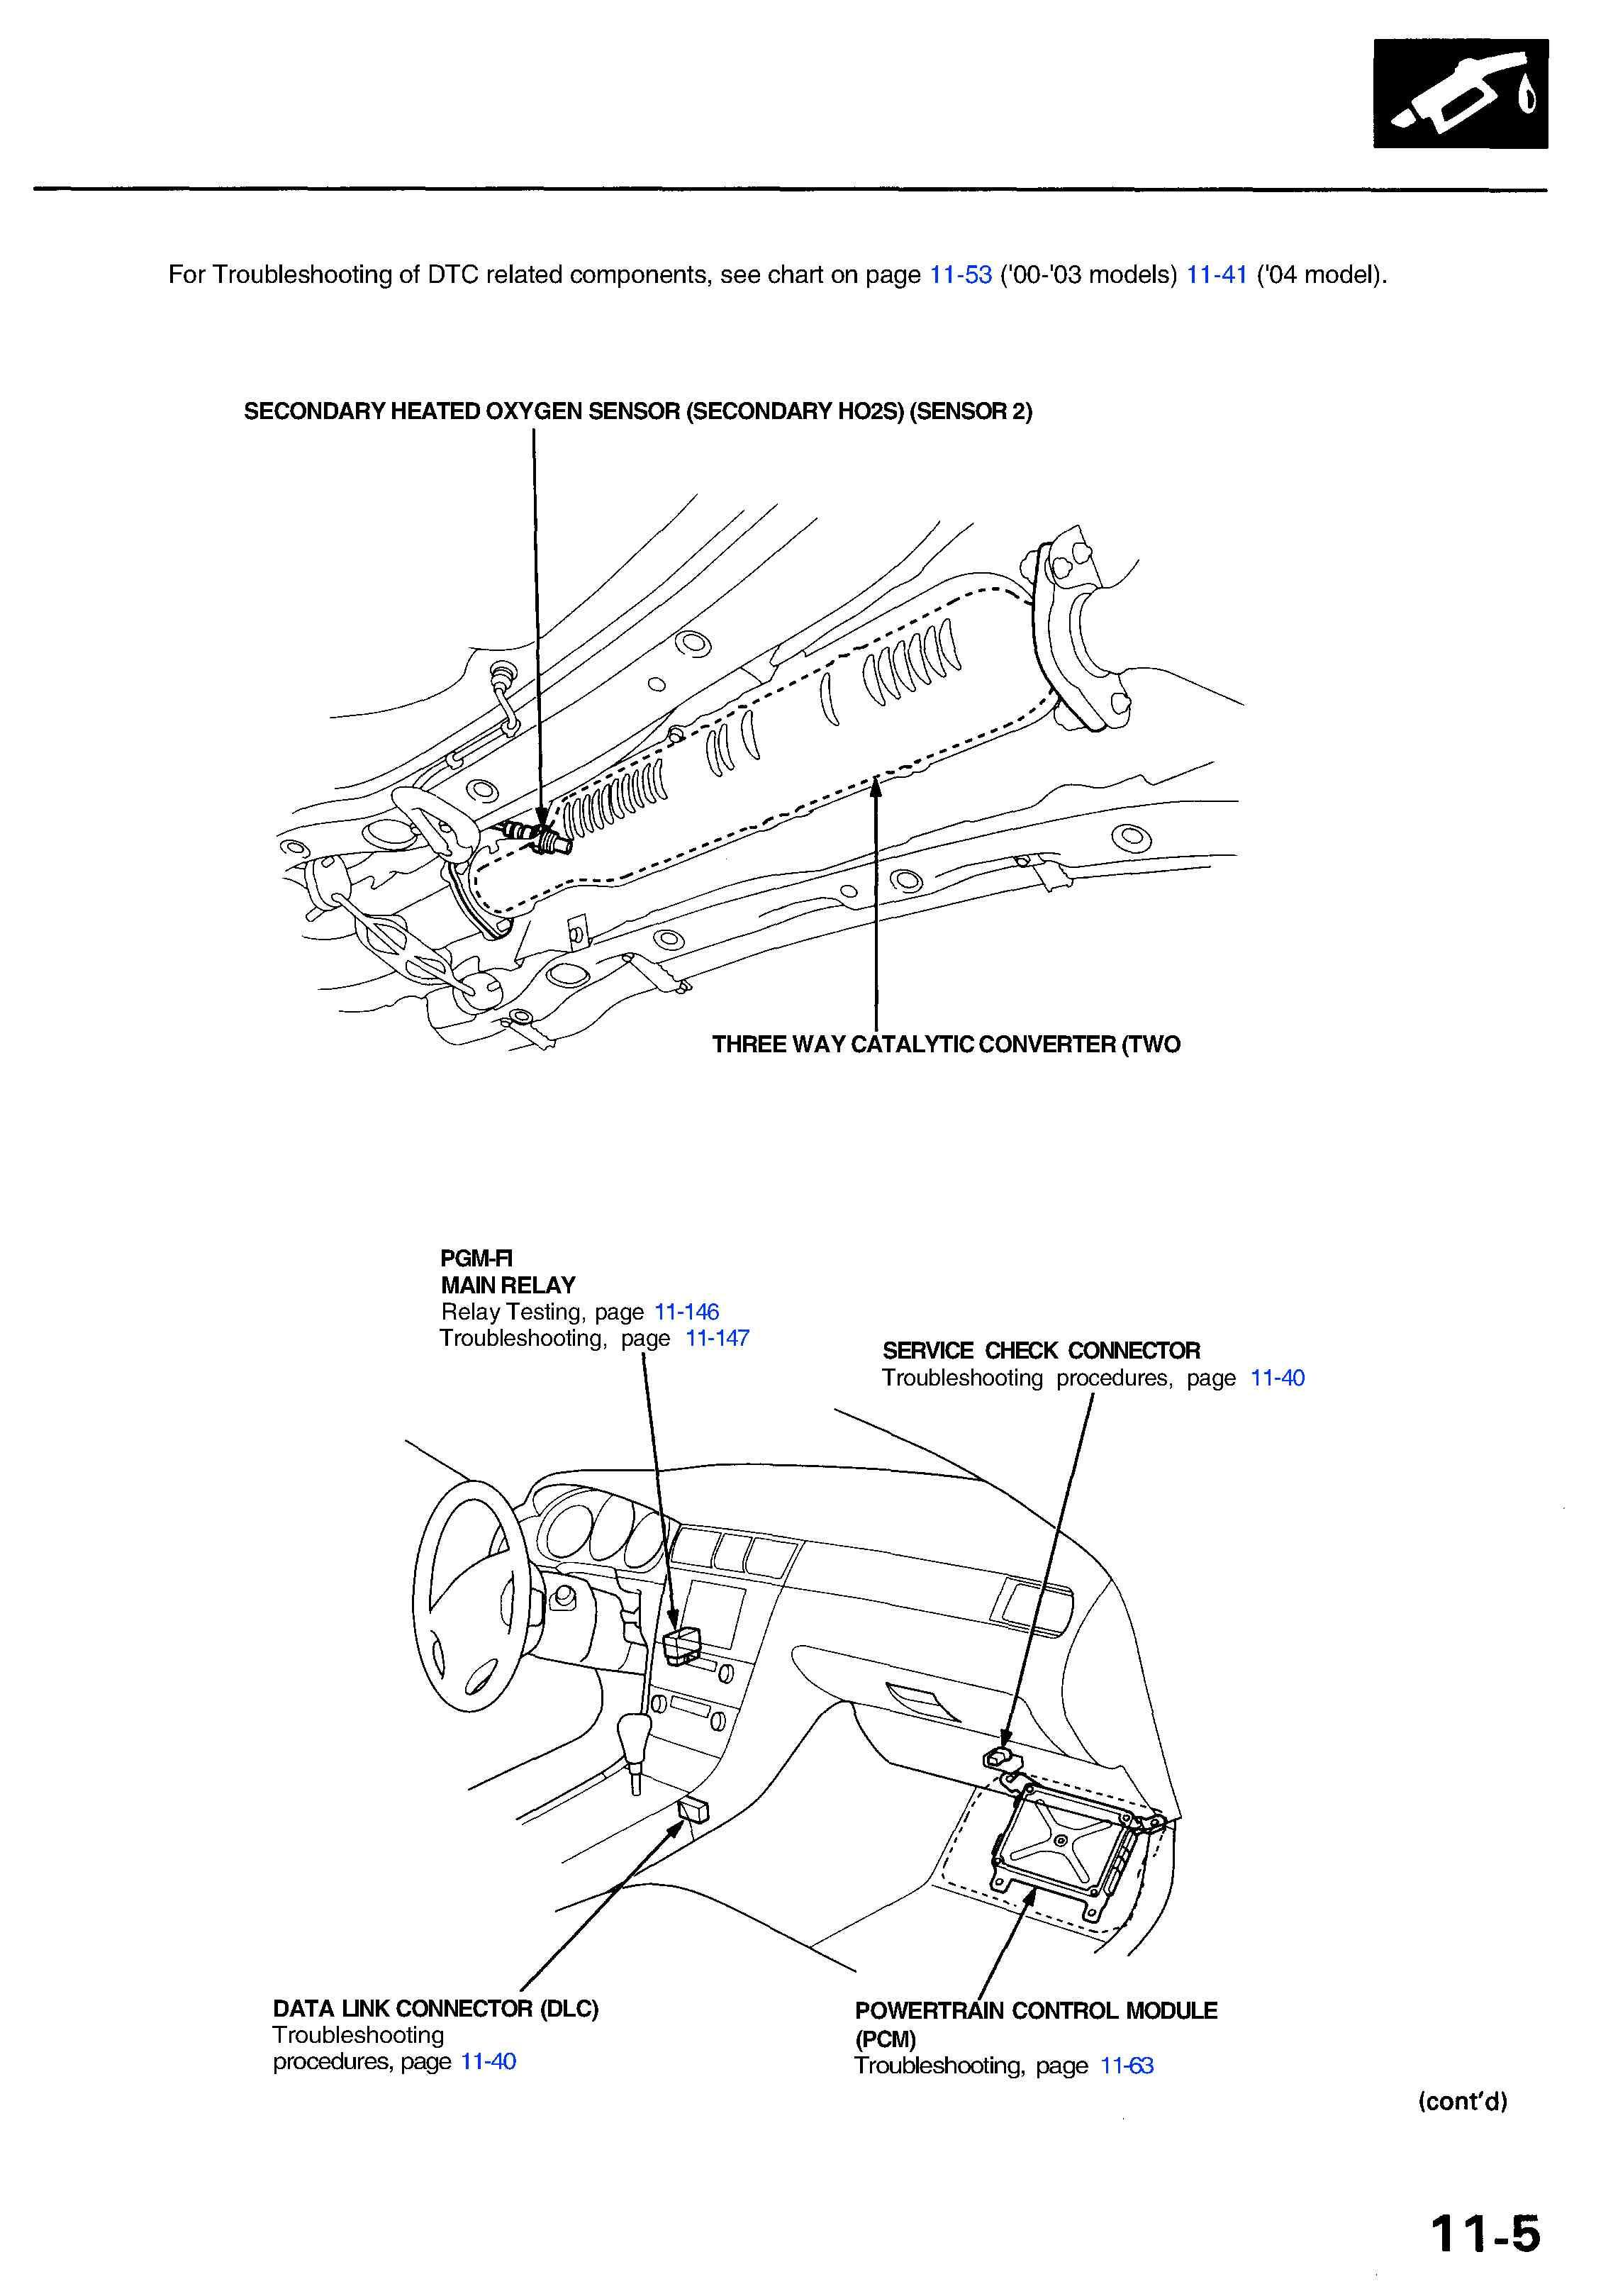 Oxygen Sensor For Toyota Avalon Wiring Diagramstoyota Xls Saturn Vue Bank 1 2 Location Acura Rl Body Kit Diagrams